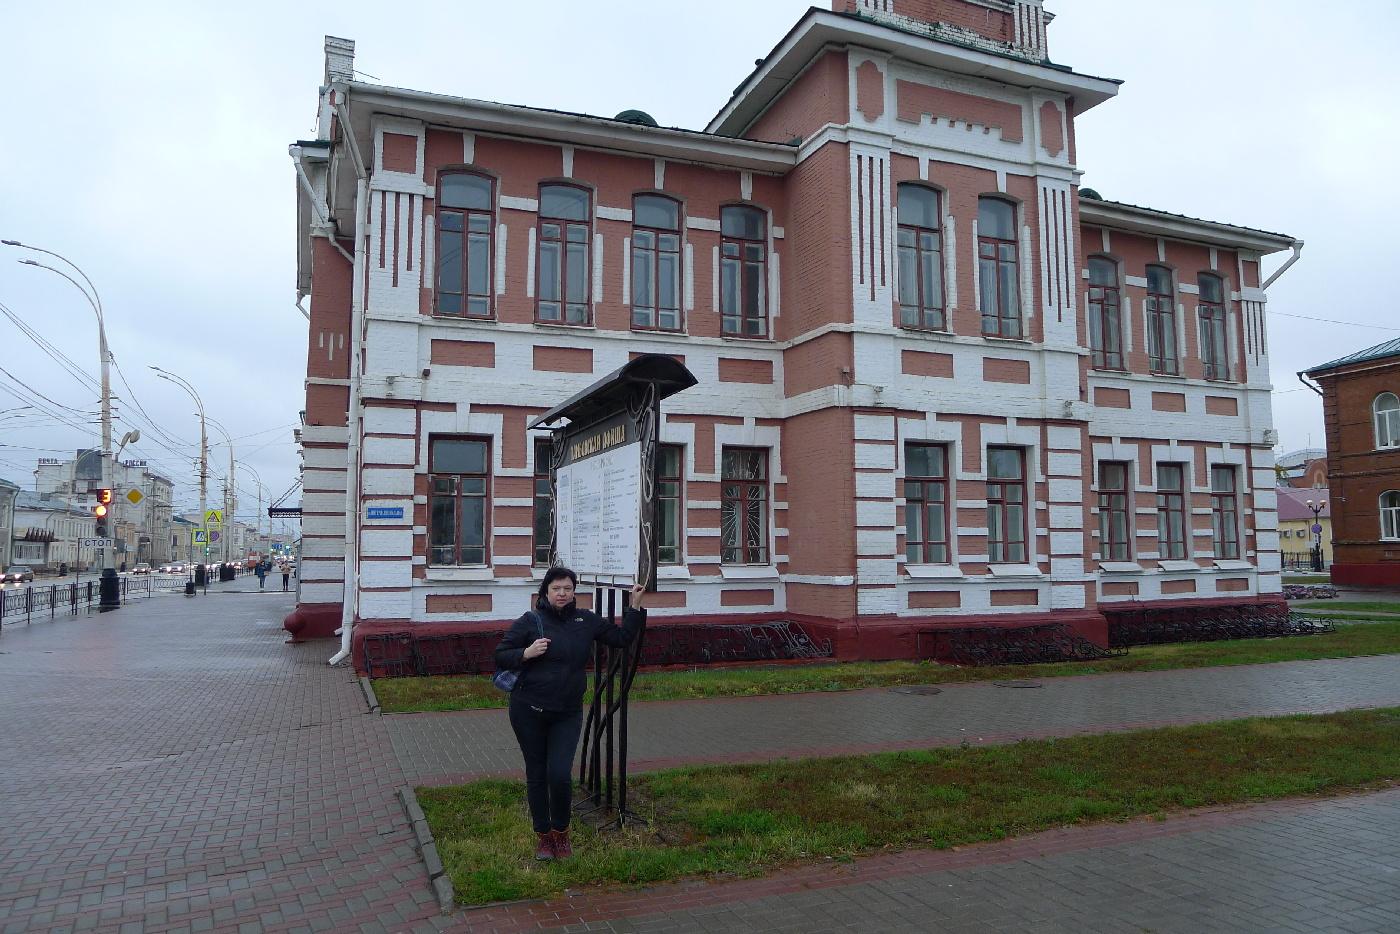 Русский Юг: Тамбов (Усадьба Асеевых, город) P1100387